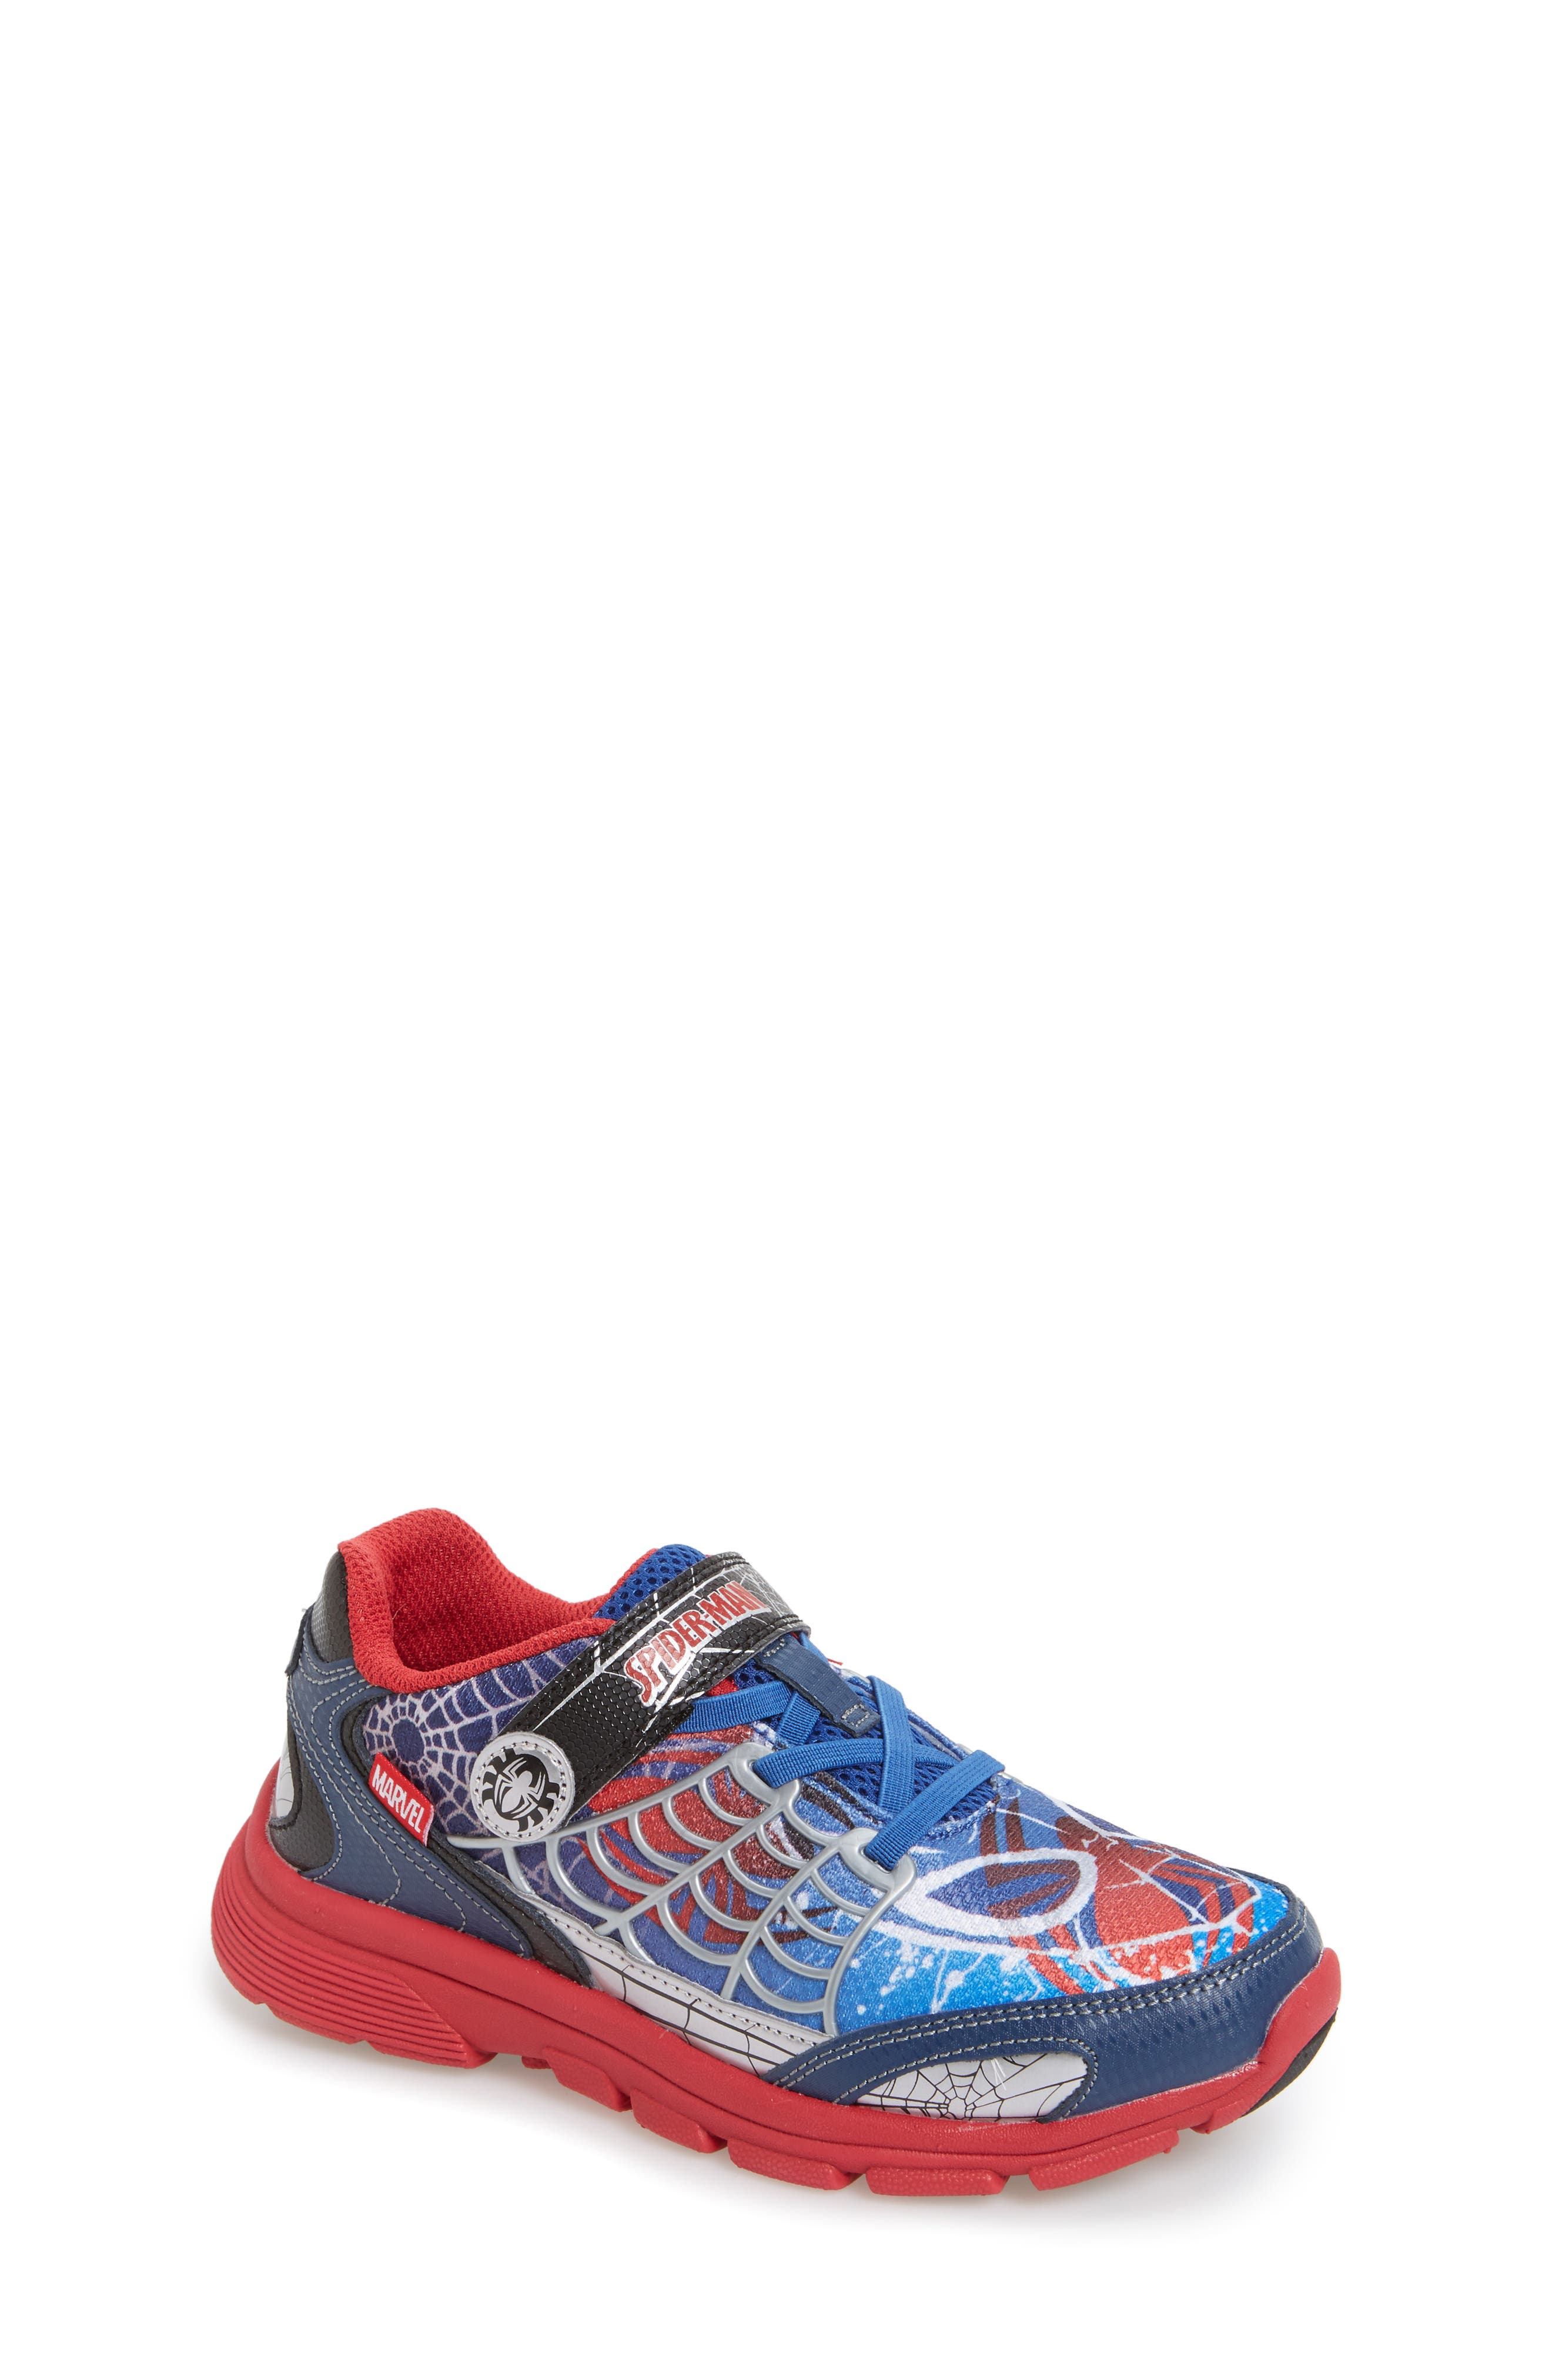 Spidey Sense Light-Up Sneaker,                             Main thumbnail 1, color,